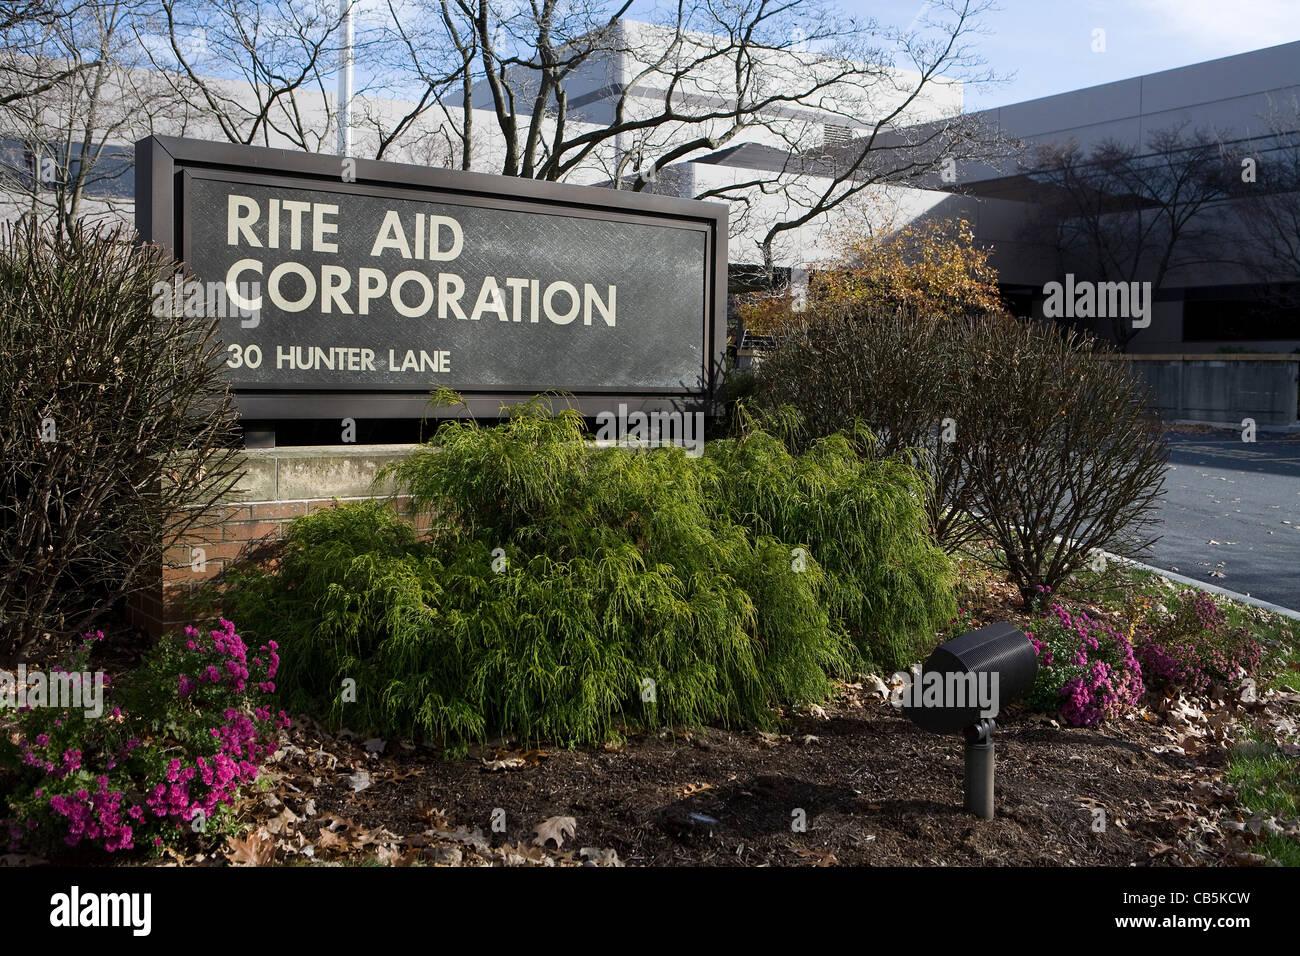 The Rite Aid Corporation corporate headquarters.  - Stock Image